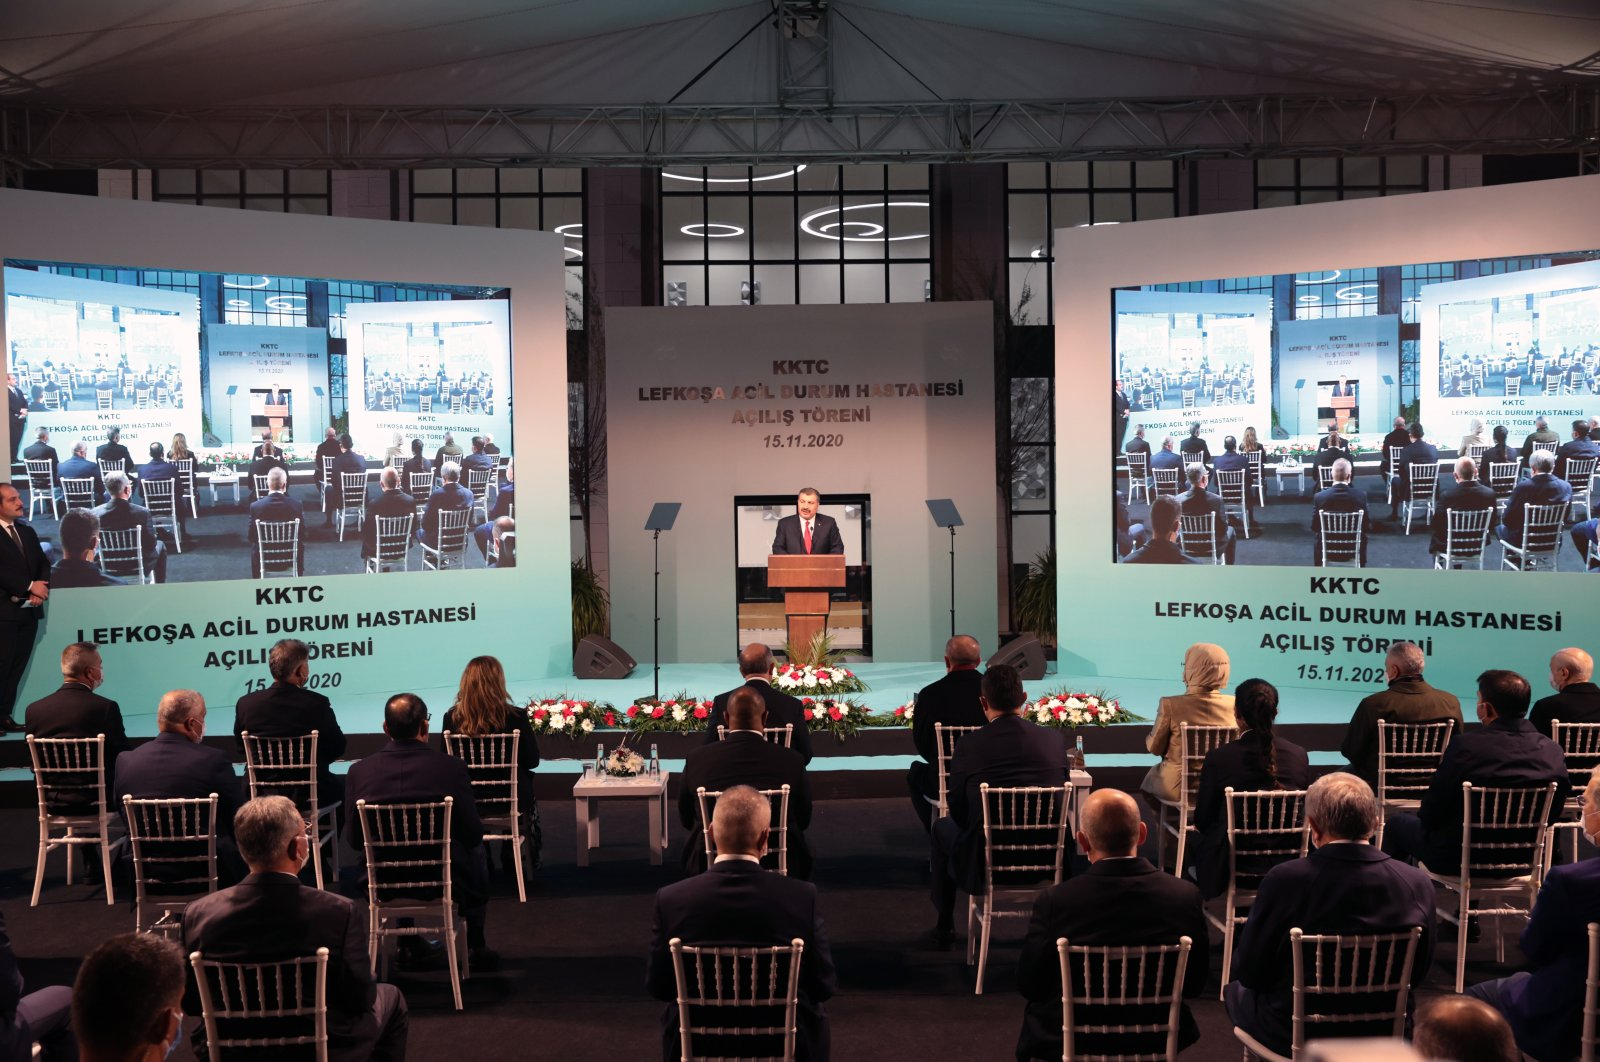 Turkish Health Minister Fahrettin Koca speaks at the opening ceremony of the Lefkoşa Emergency Hospital, Lefkoşa, Turkish Republic of Northern Cyprus (TRNC), Nov. 15, 2020. (AA Photo)